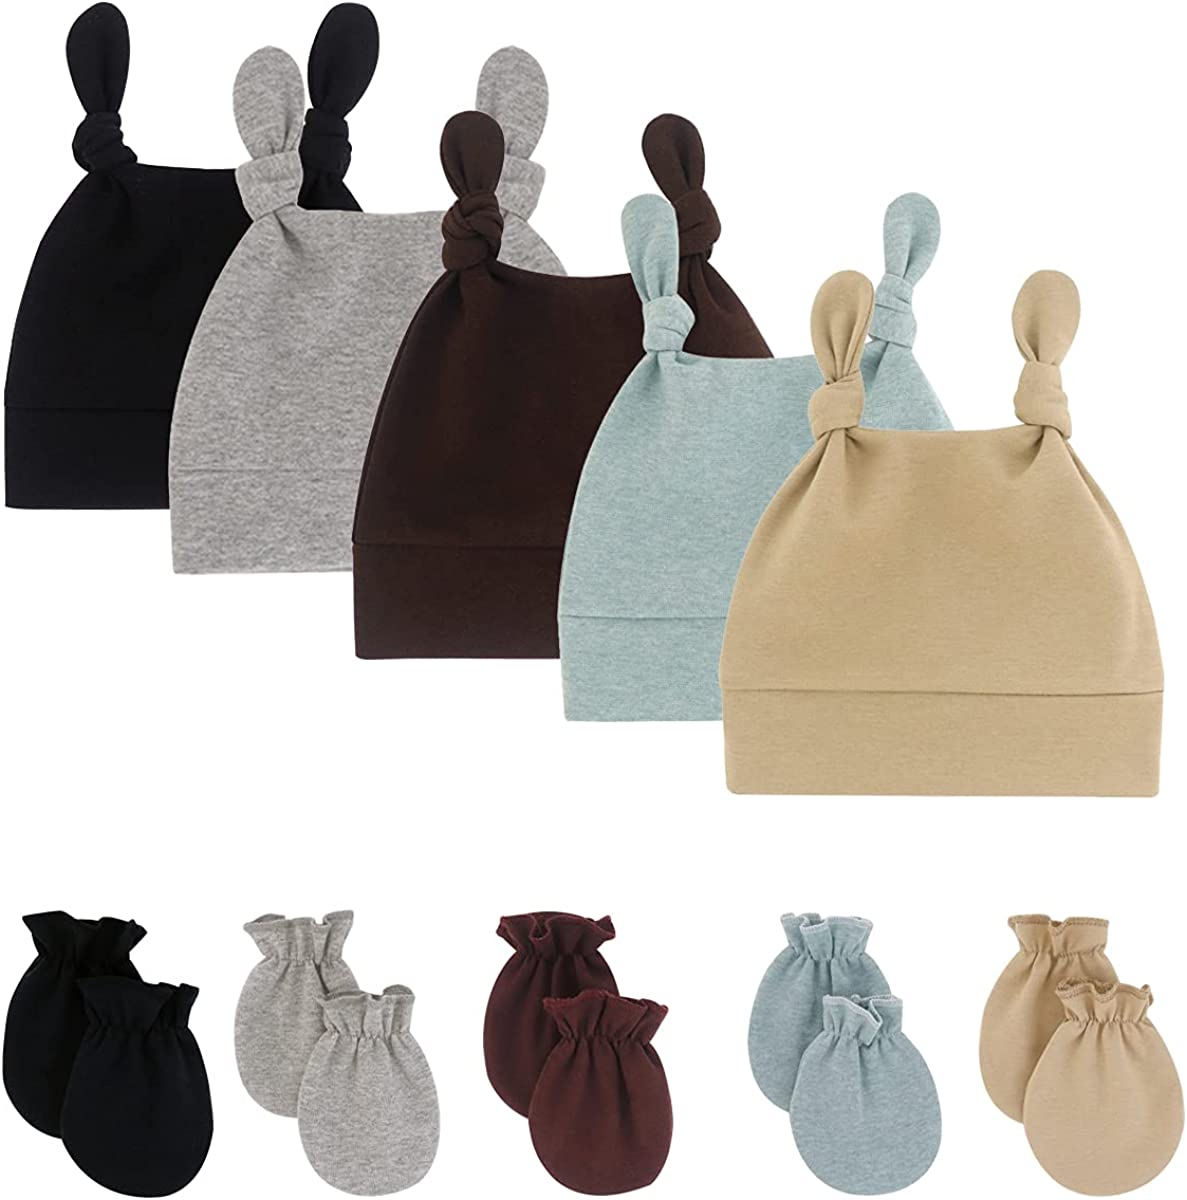 Newborn Infant Baby Boys Mittens Beanie Hats Gift Set Cotton Gloves Skull Caps for 0-12 Months Unisex Baby Girls